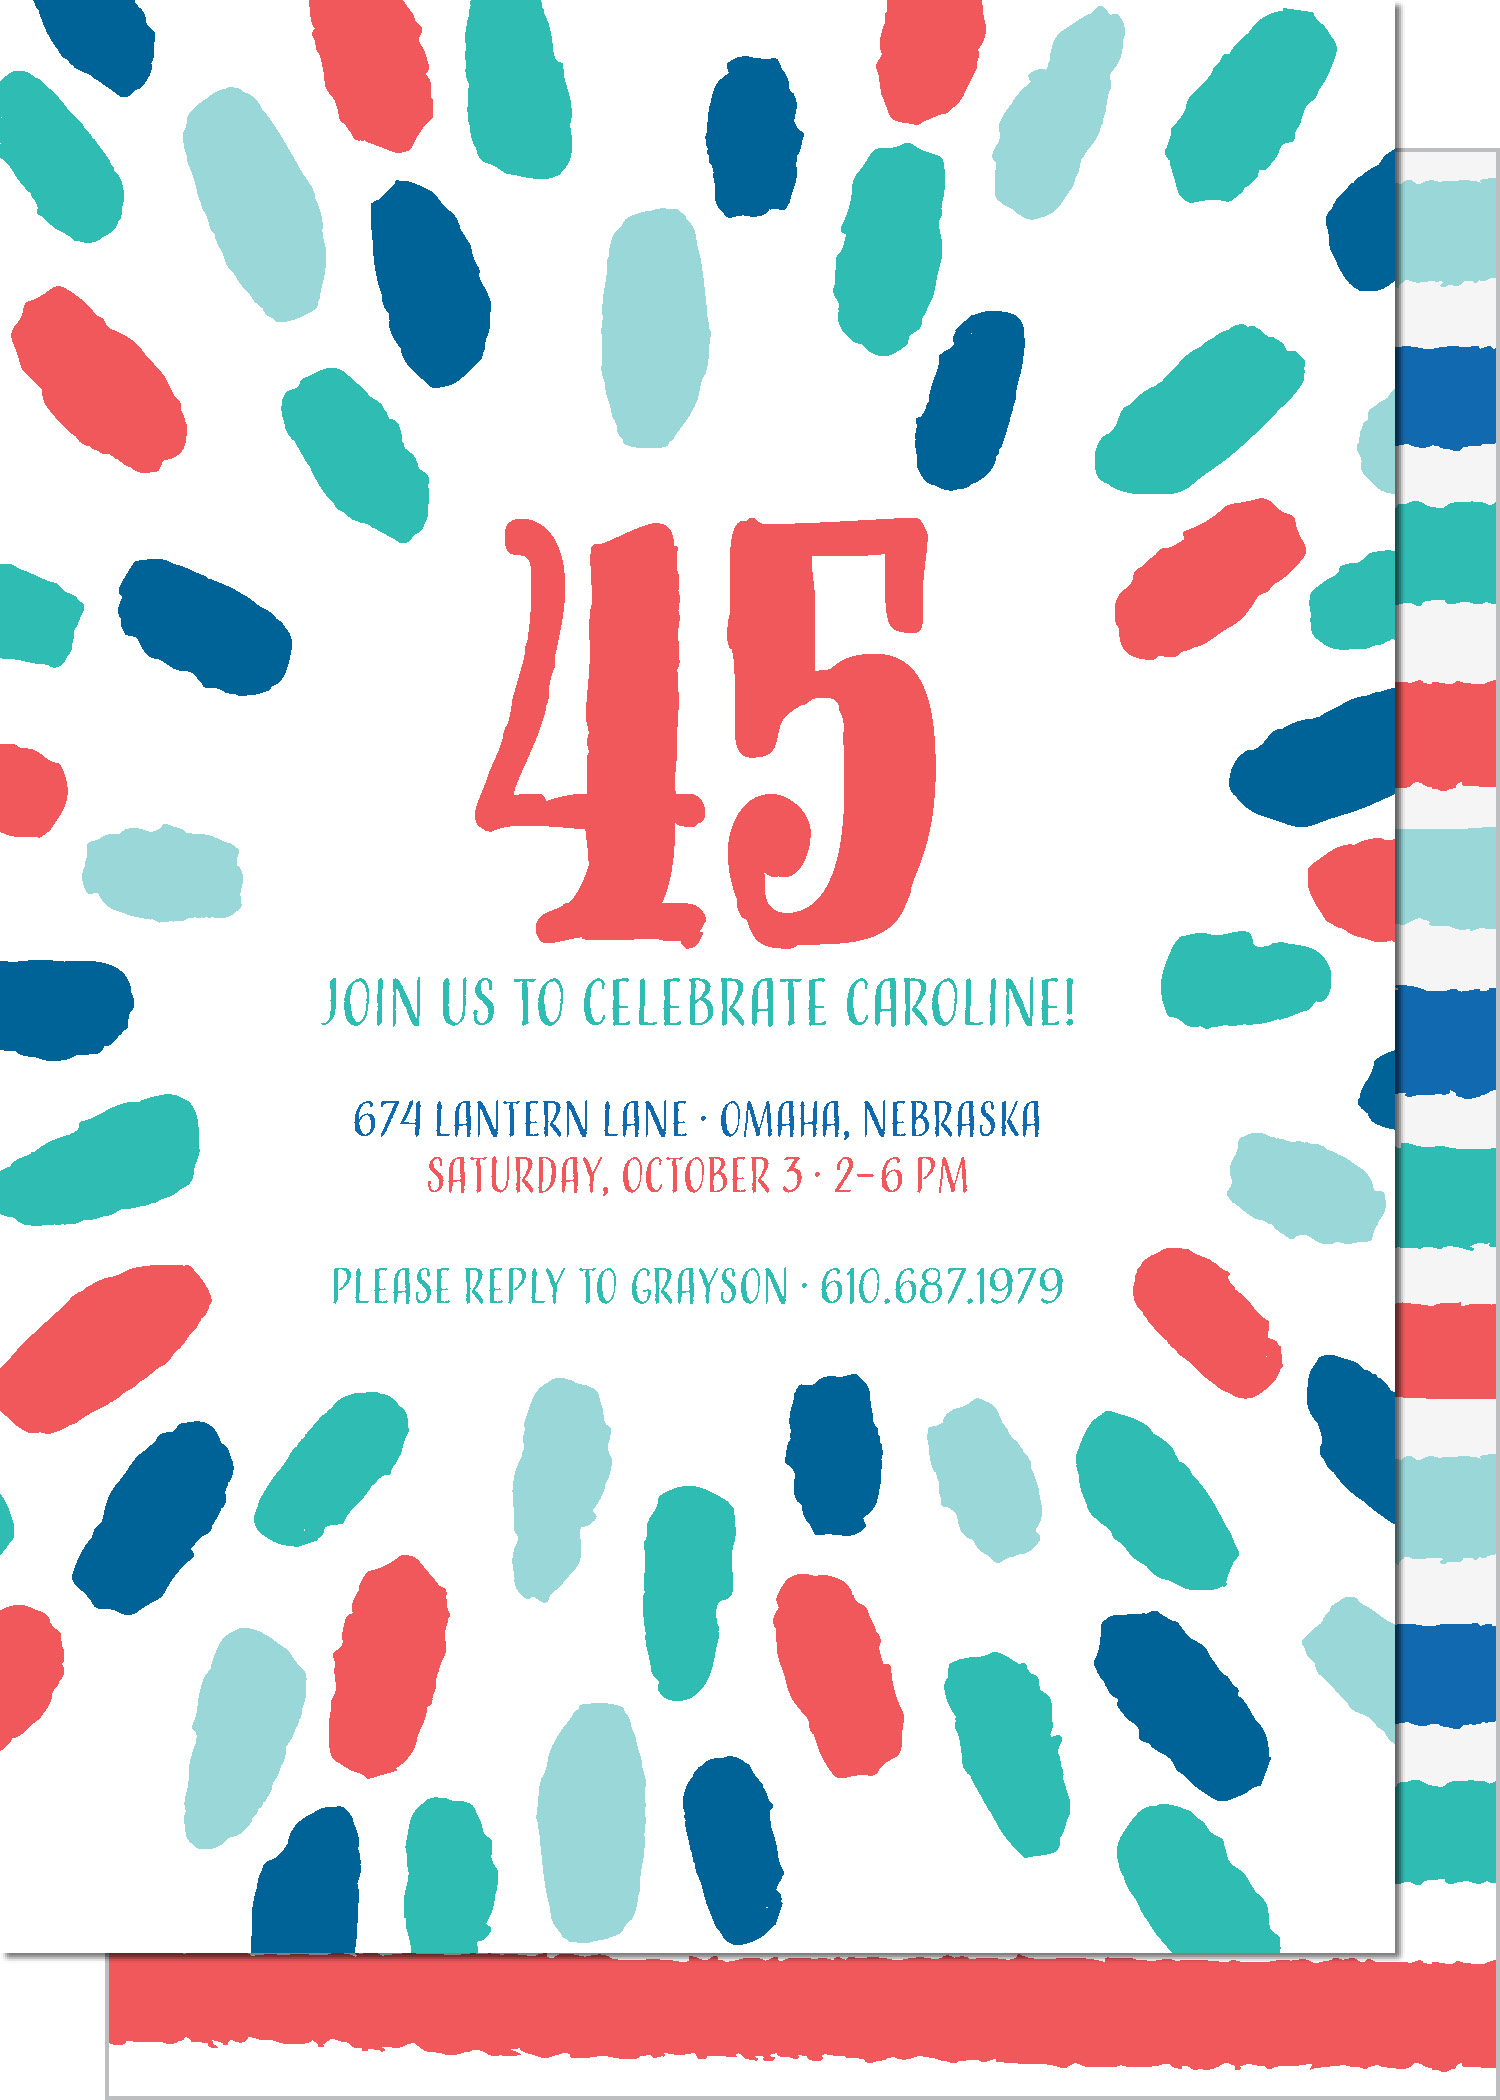 KD3112IN-PB Sunburst Birthday